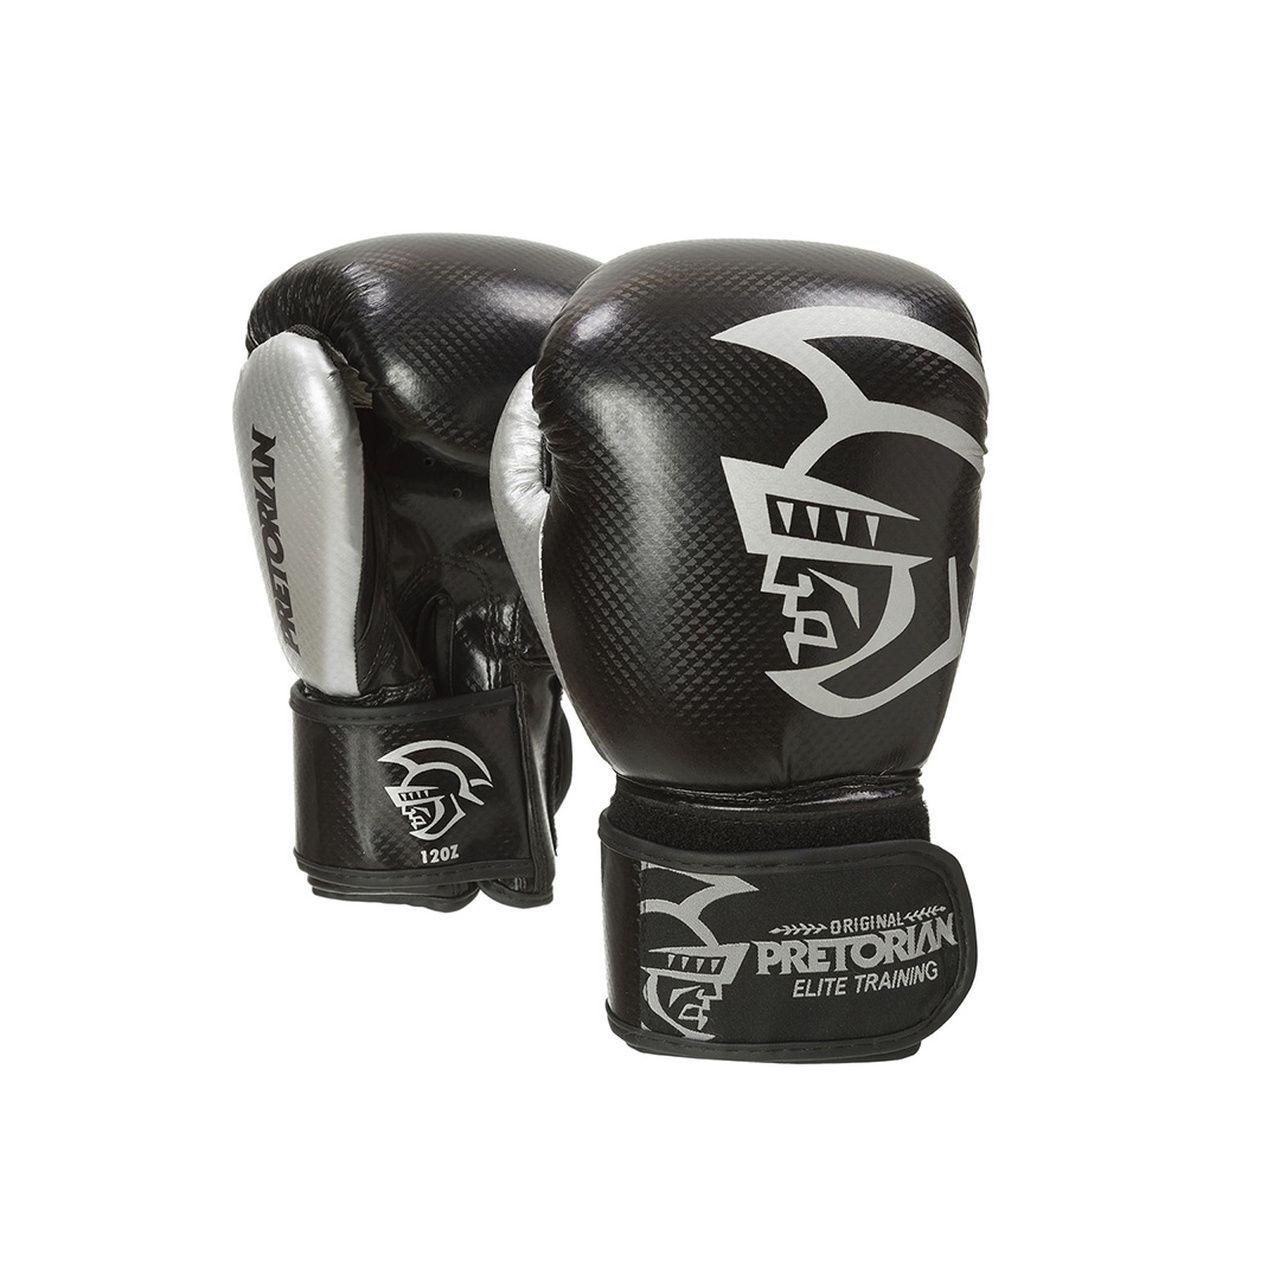 Luva Muay Thai Boxe Elite - Pretorian [preta] 10oz